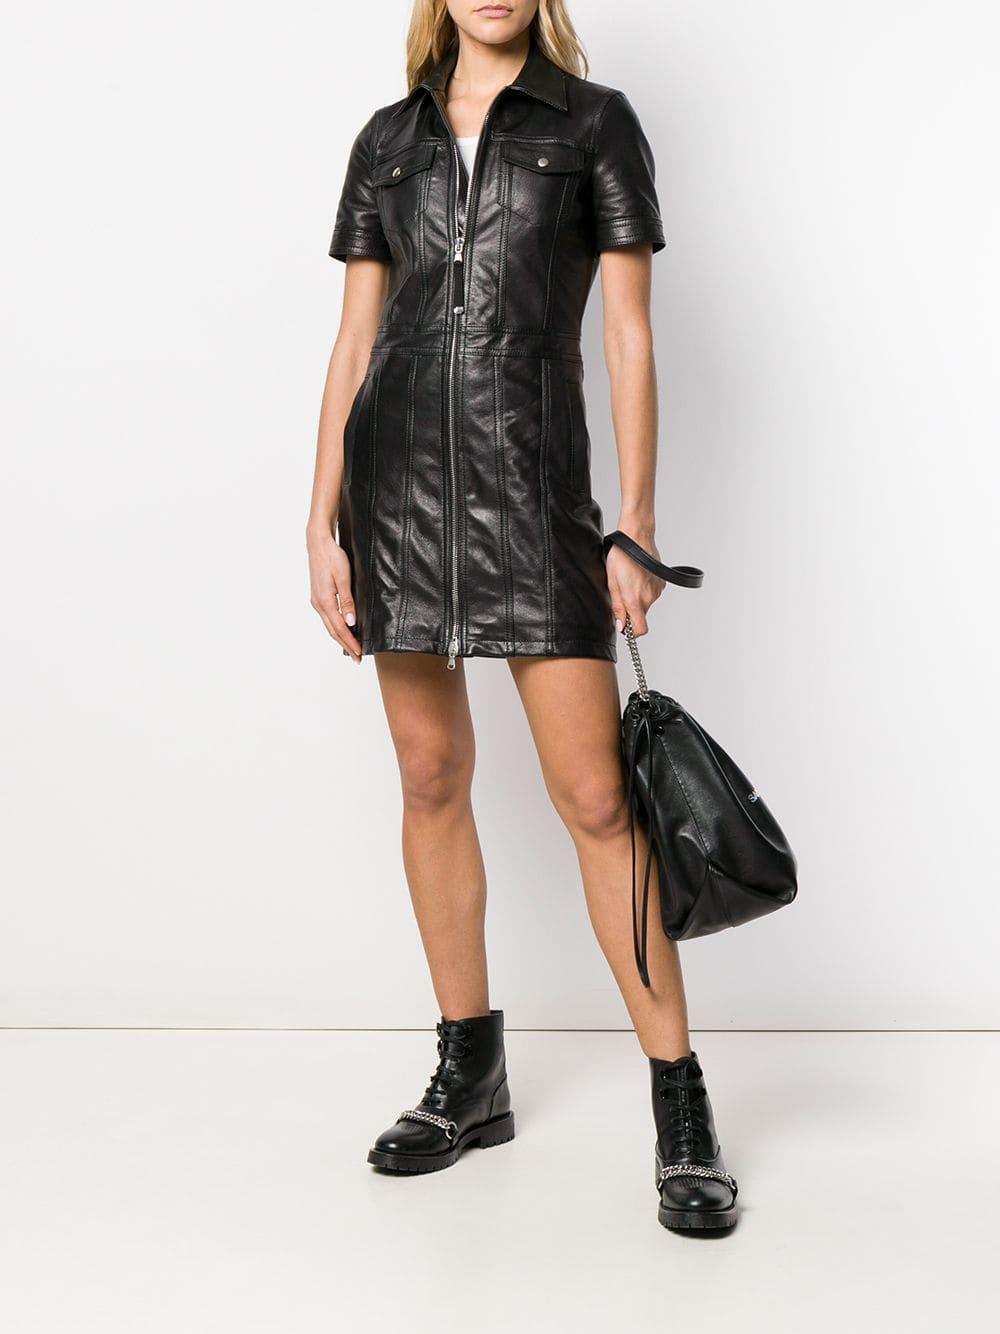 16d23d3effe Lyst - Diesel Black Gold Short Fitted Dress in Black